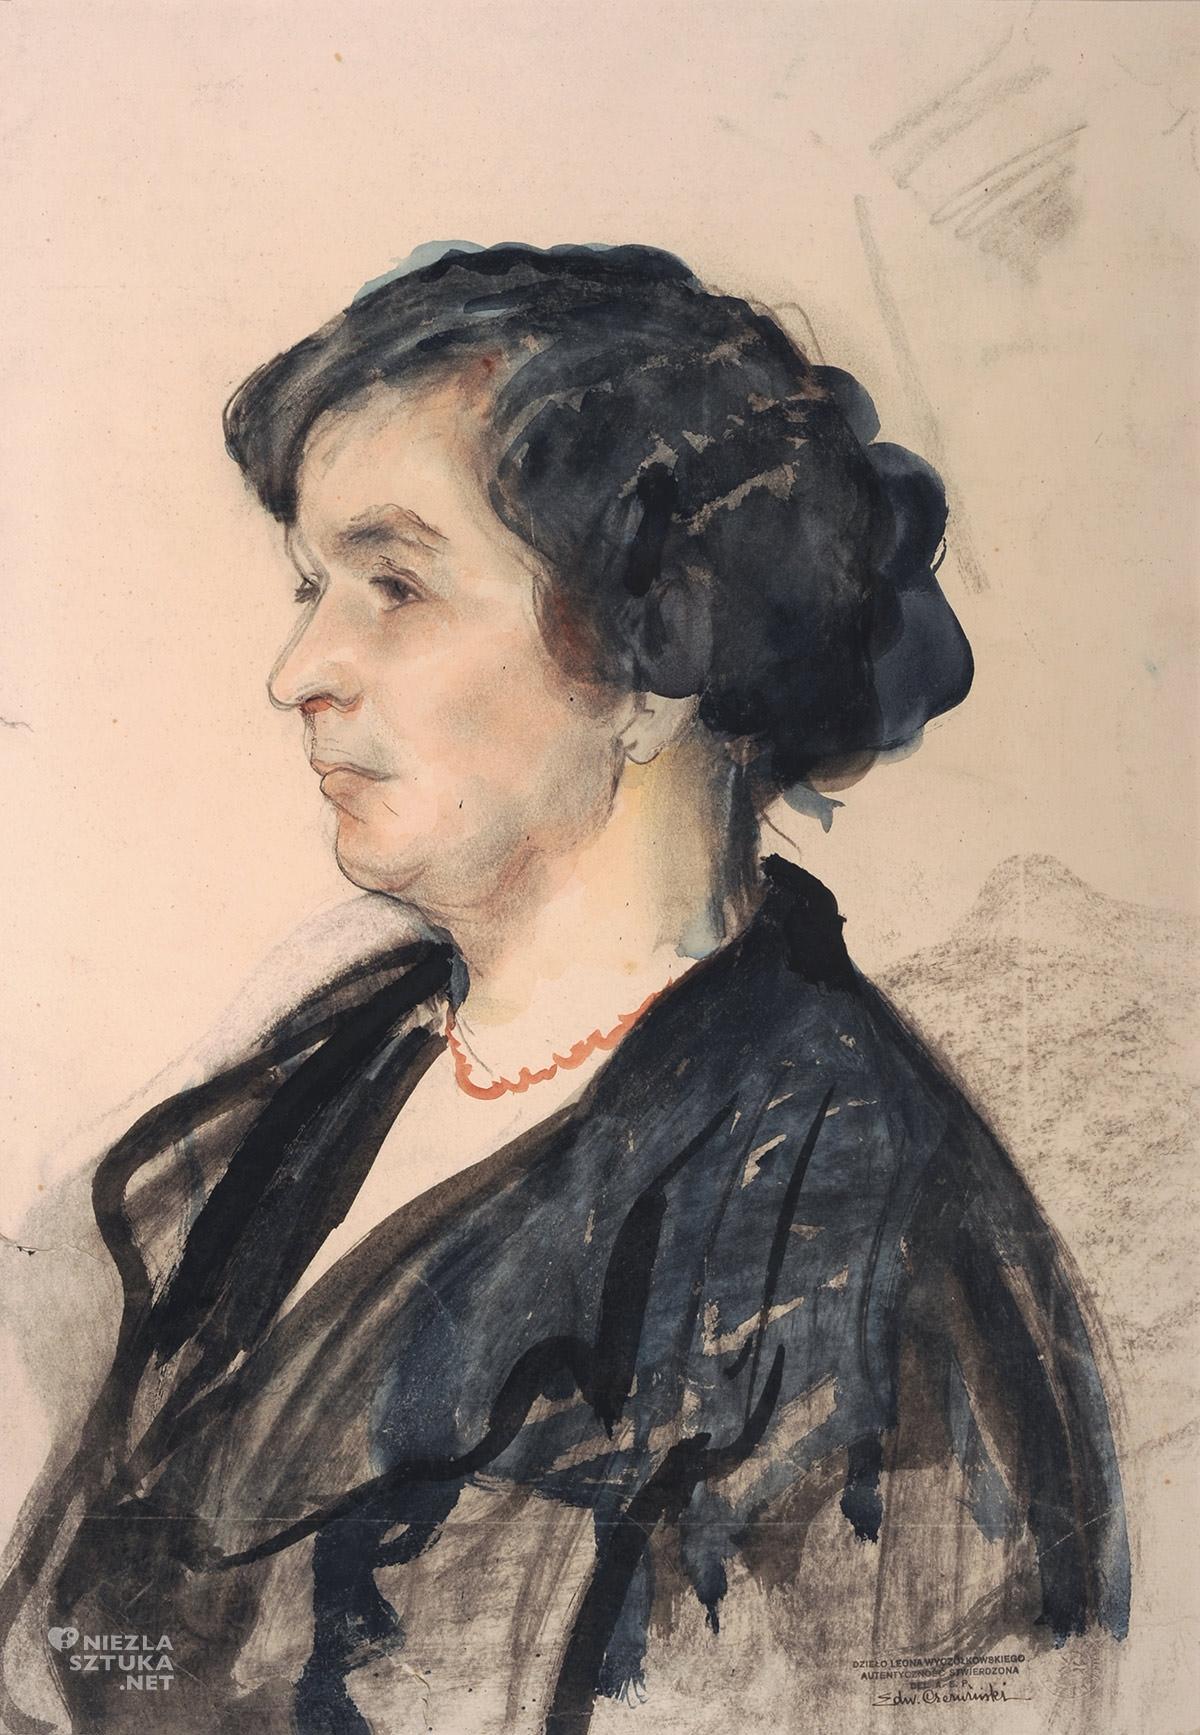 Leon Wyczółkowski, Franciszka Wyczółkowska, żona artysty, sztuka polska, portret, Niezła sztuka